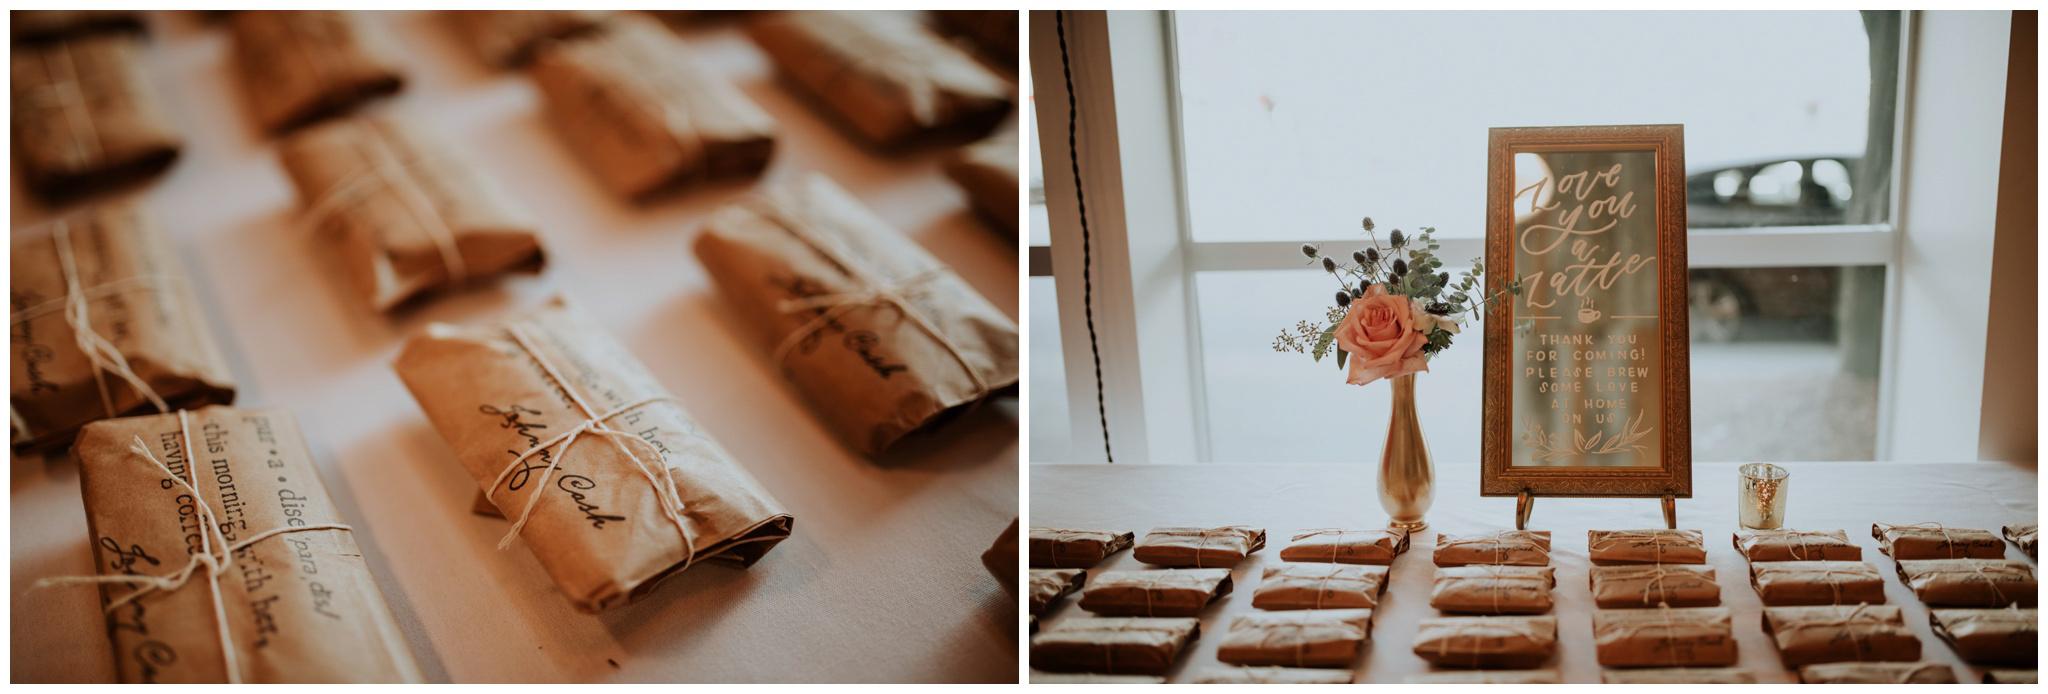 alyssa-keiran-westland-distillery-urban-seattle-wedding-photographer-caitlyn-nikula-99.jpg